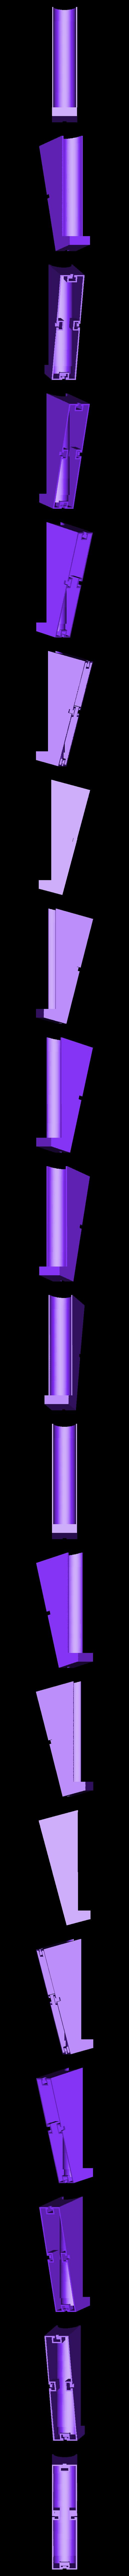 Atomizer_001.stl Download free STL file Vape Stand v 2 • 3D printer design, xip28xip